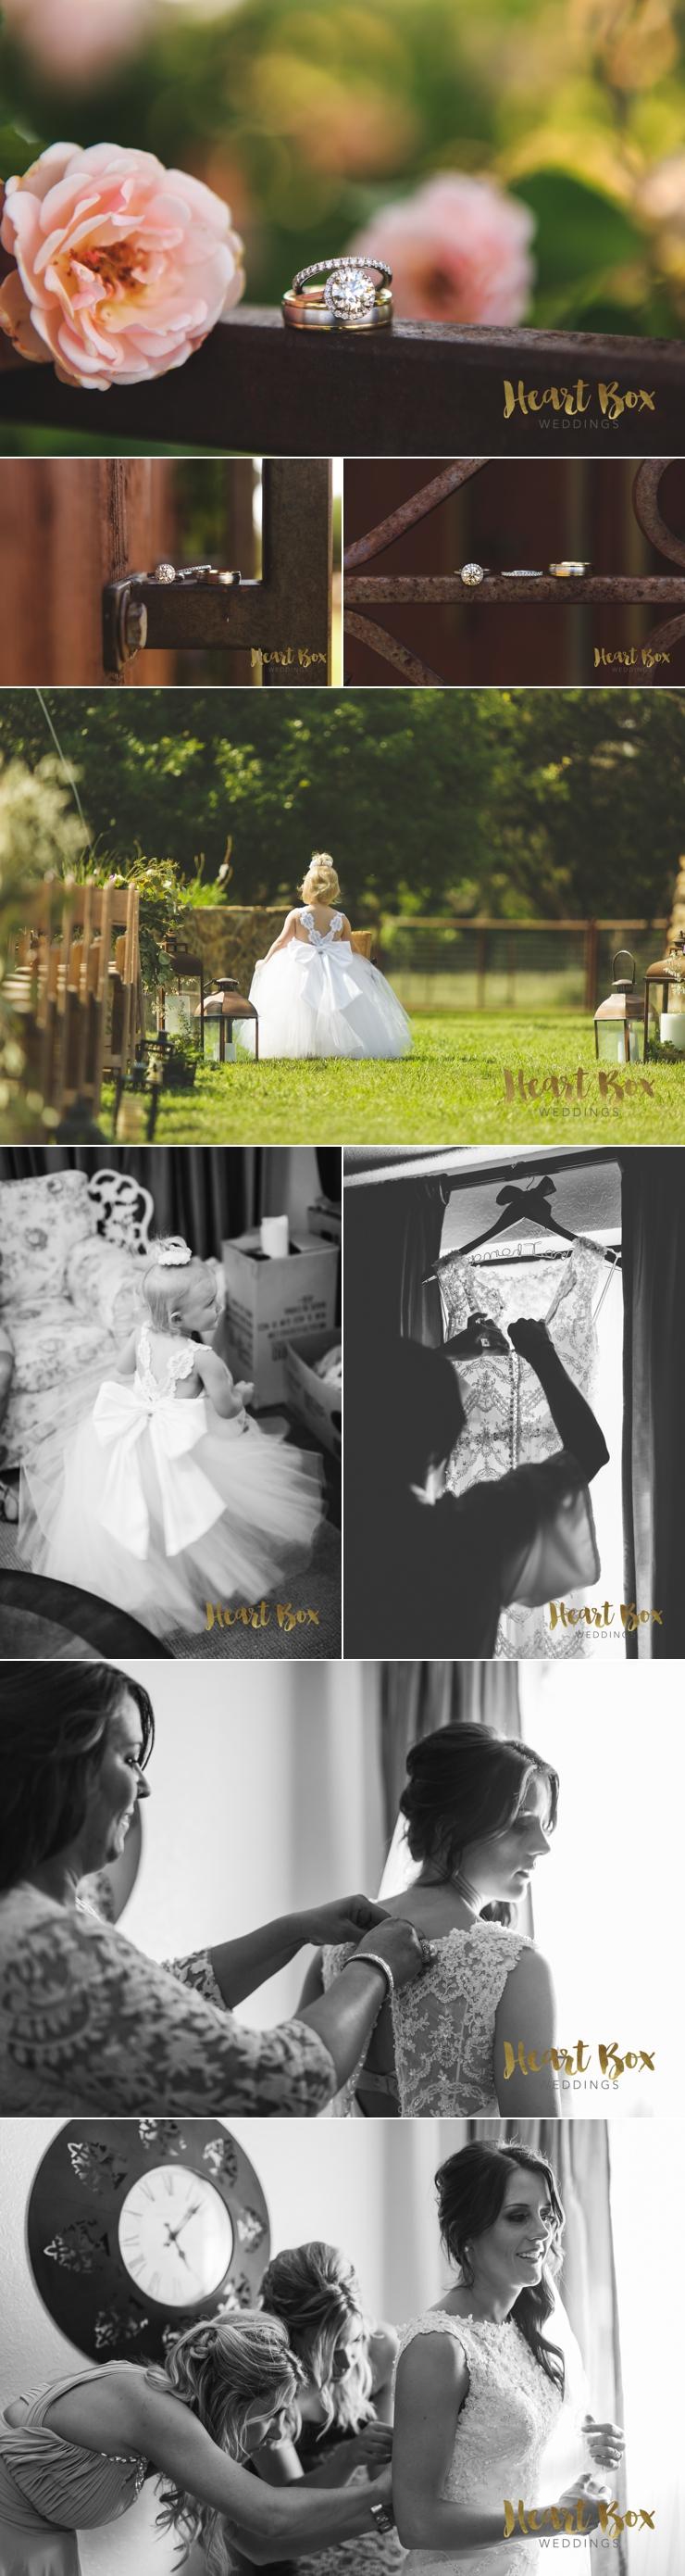 Thomas Wedding Blog Collages 2.jpg